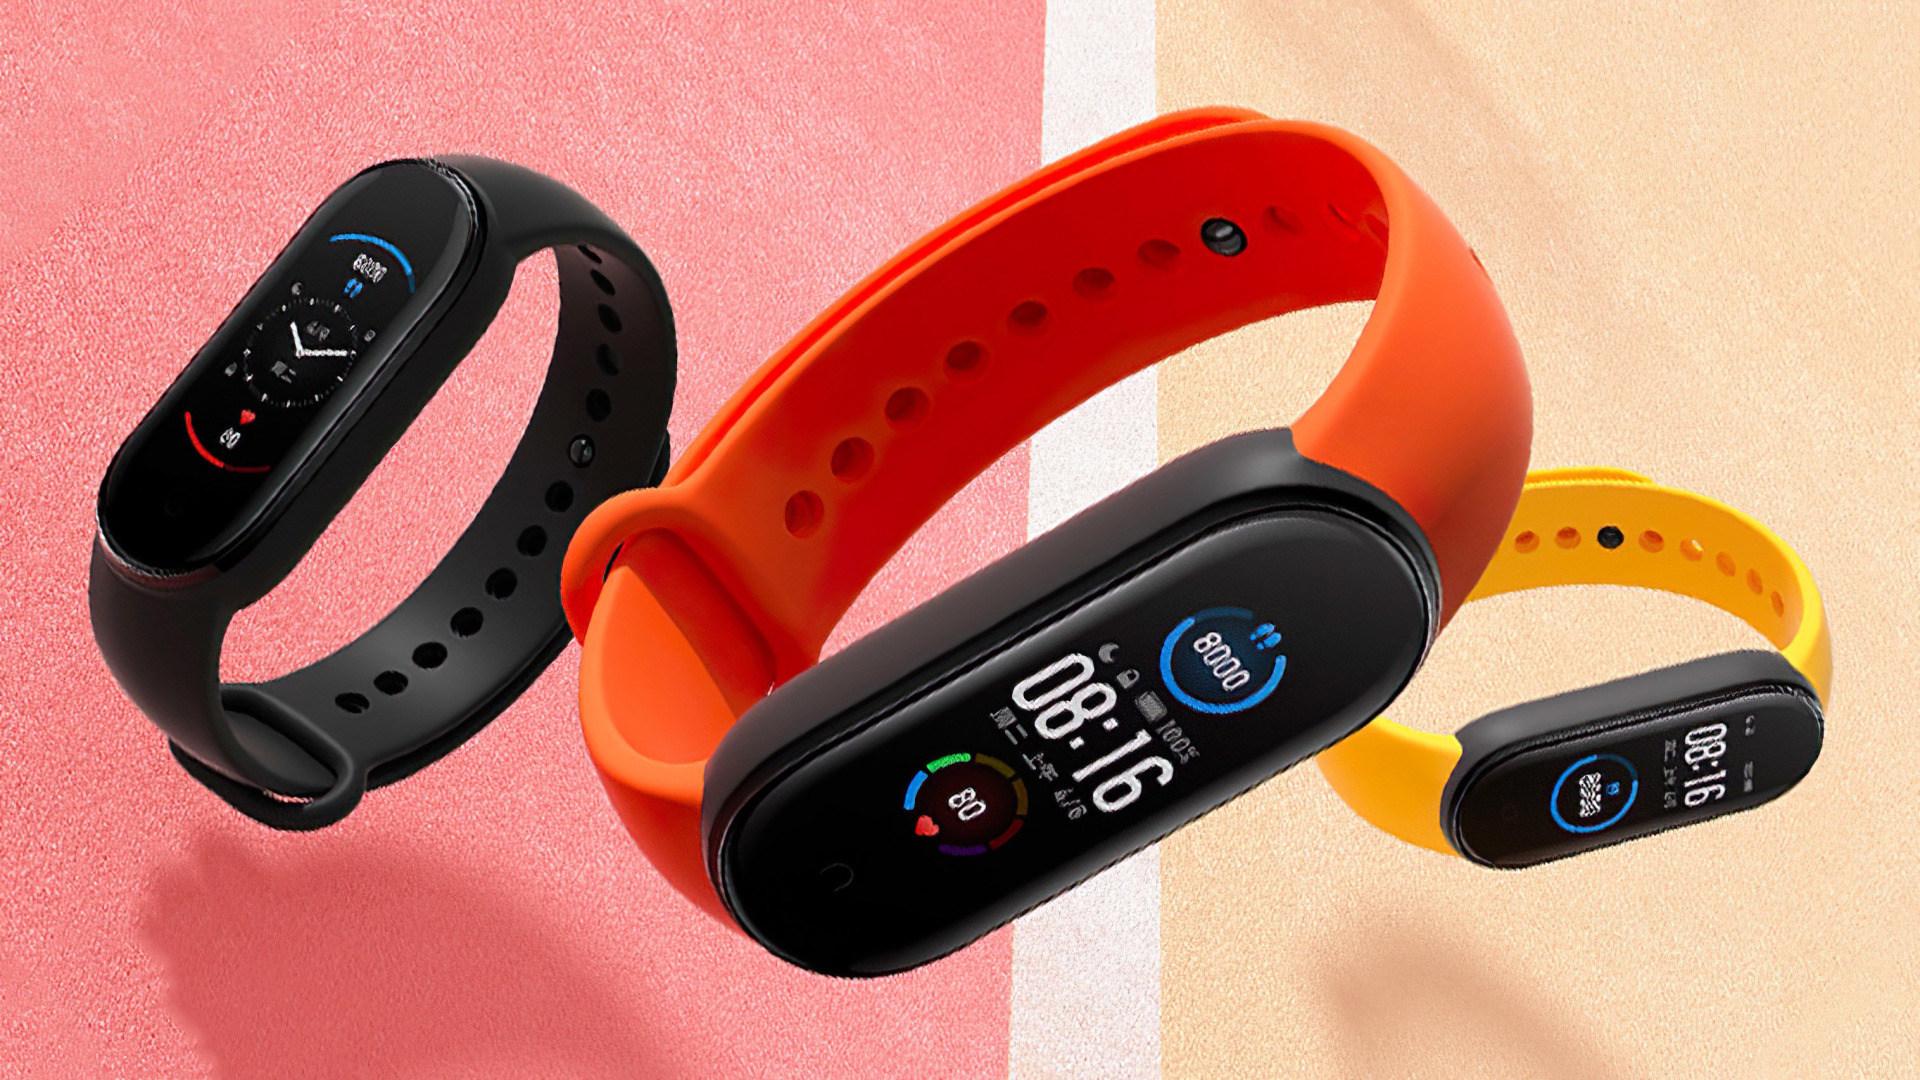 smartwatch, Xiaomi, Uhr, Wearables, Fitness-Tracker, Fitness, Fitnesstracker, Fitness-Band, Xiaomi Mi Band 5